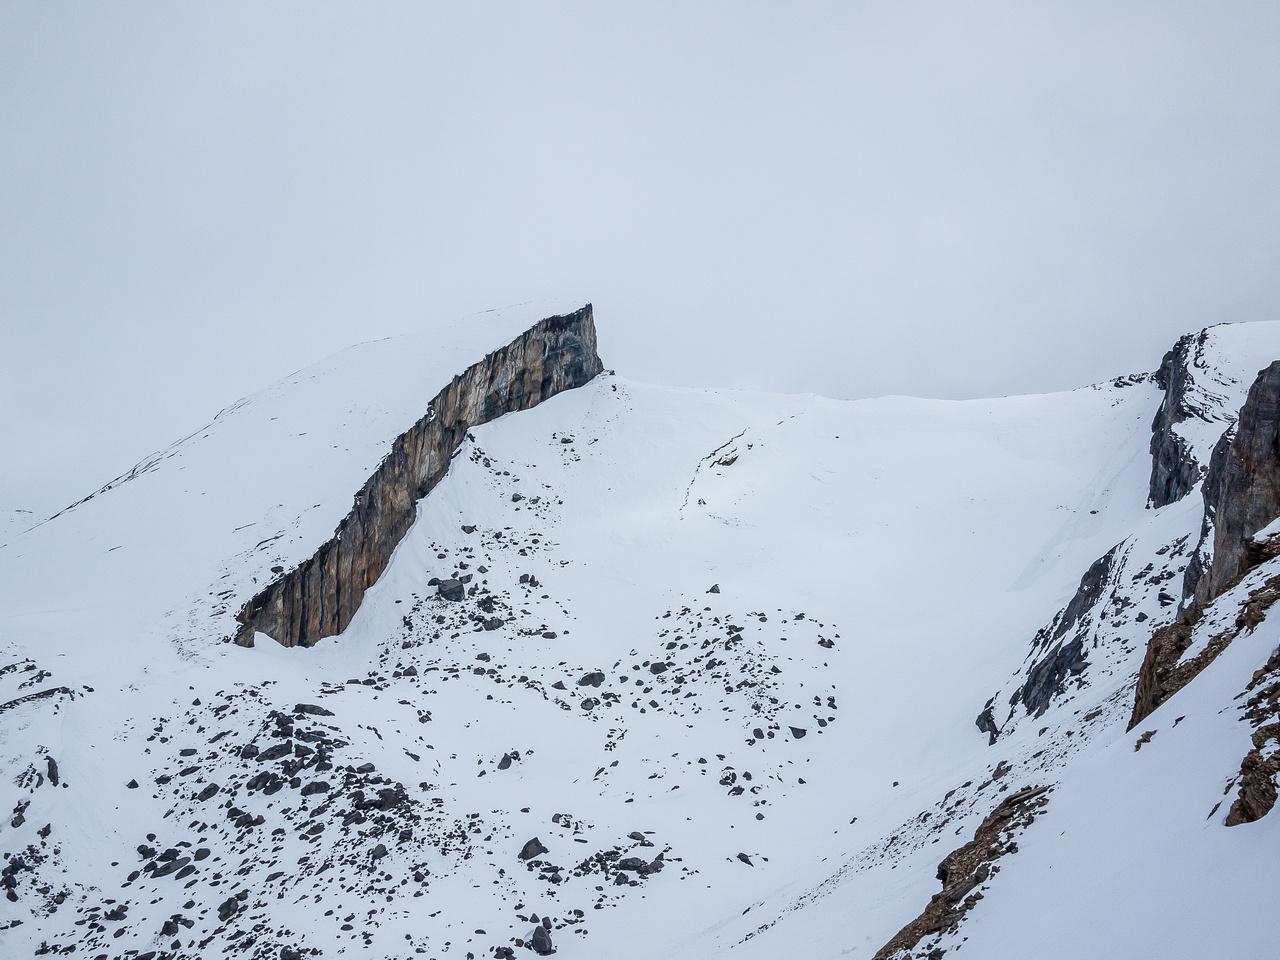 Ramp Peak is a great ski objective!